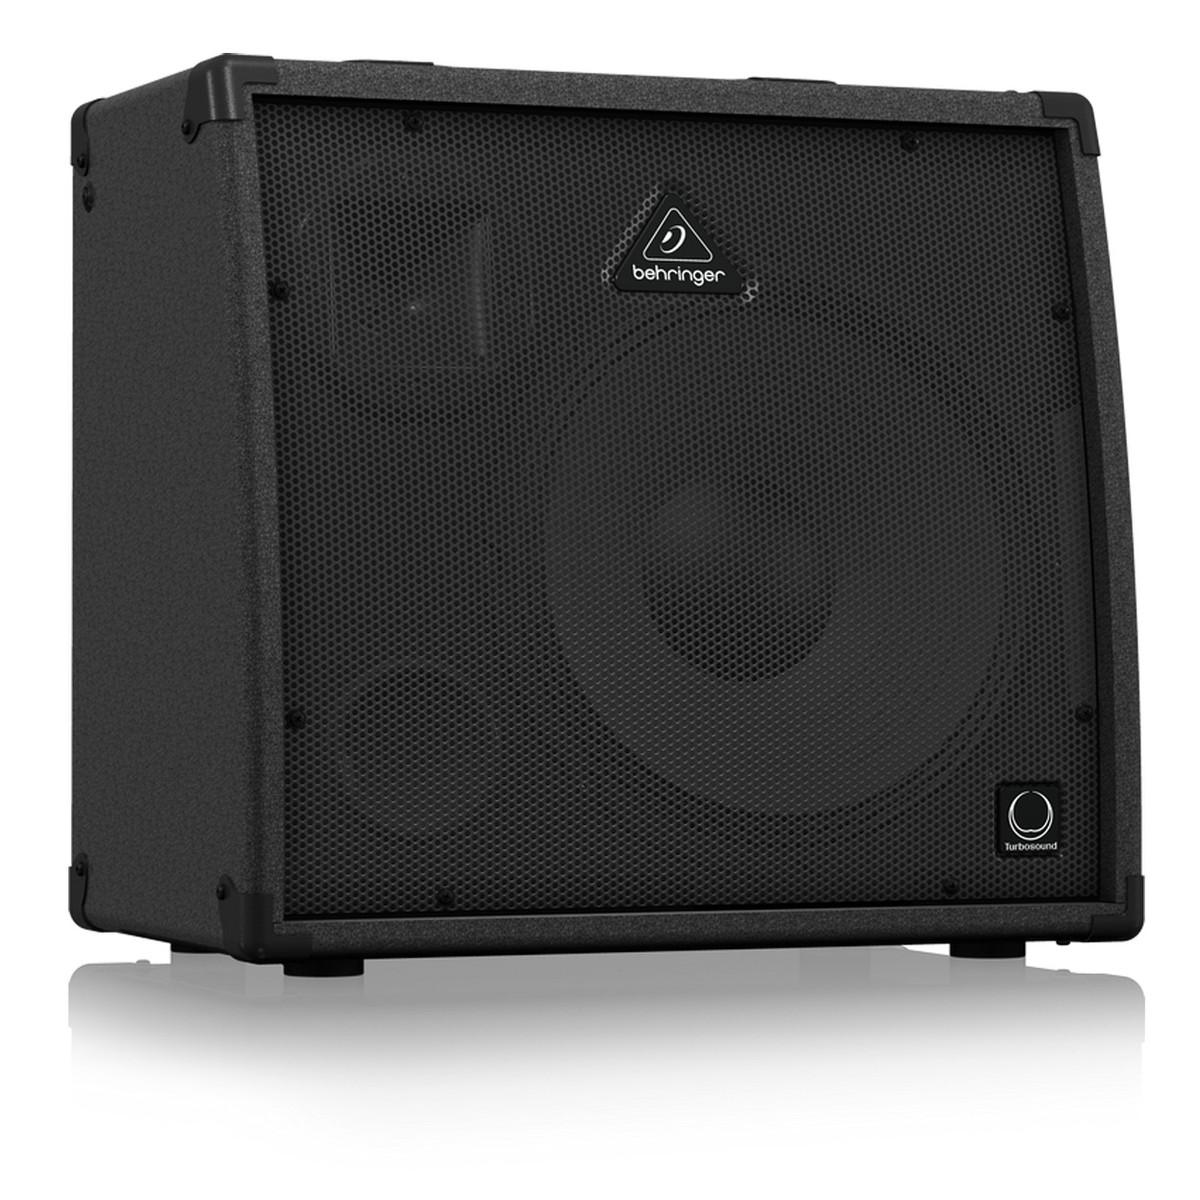 behringer ultratone kxd12 pa system keyboard amplifier at gear4music. Black Bedroom Furniture Sets. Home Design Ideas